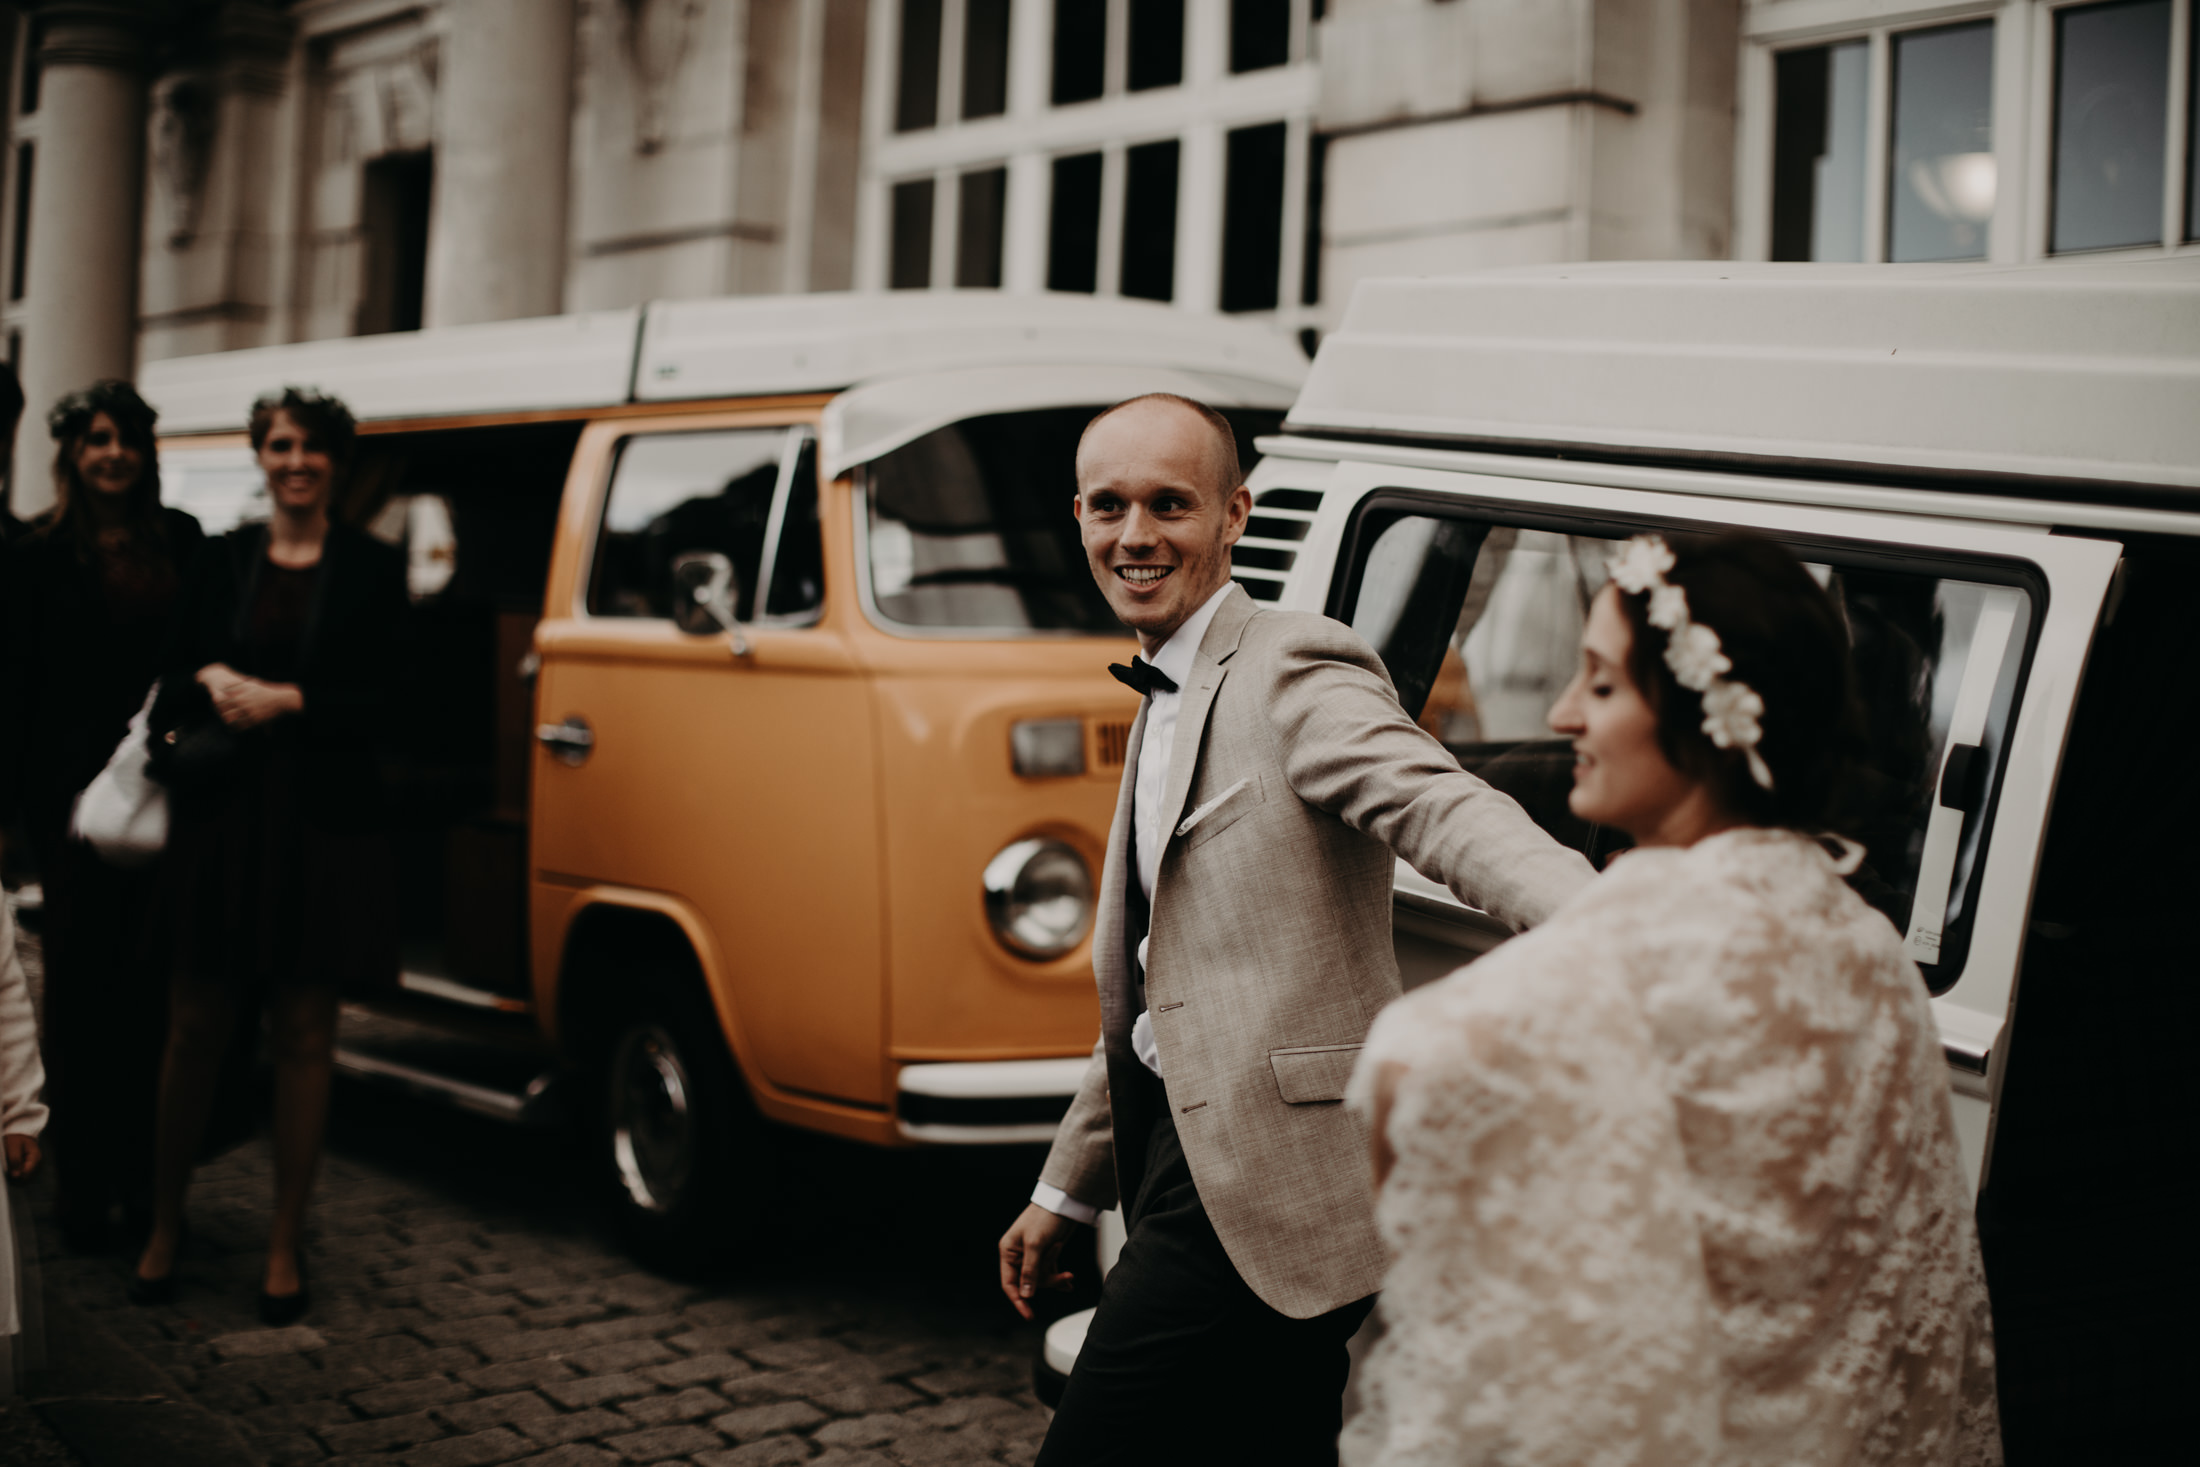 Mariage auvergne photographe wedding_-22.jpg